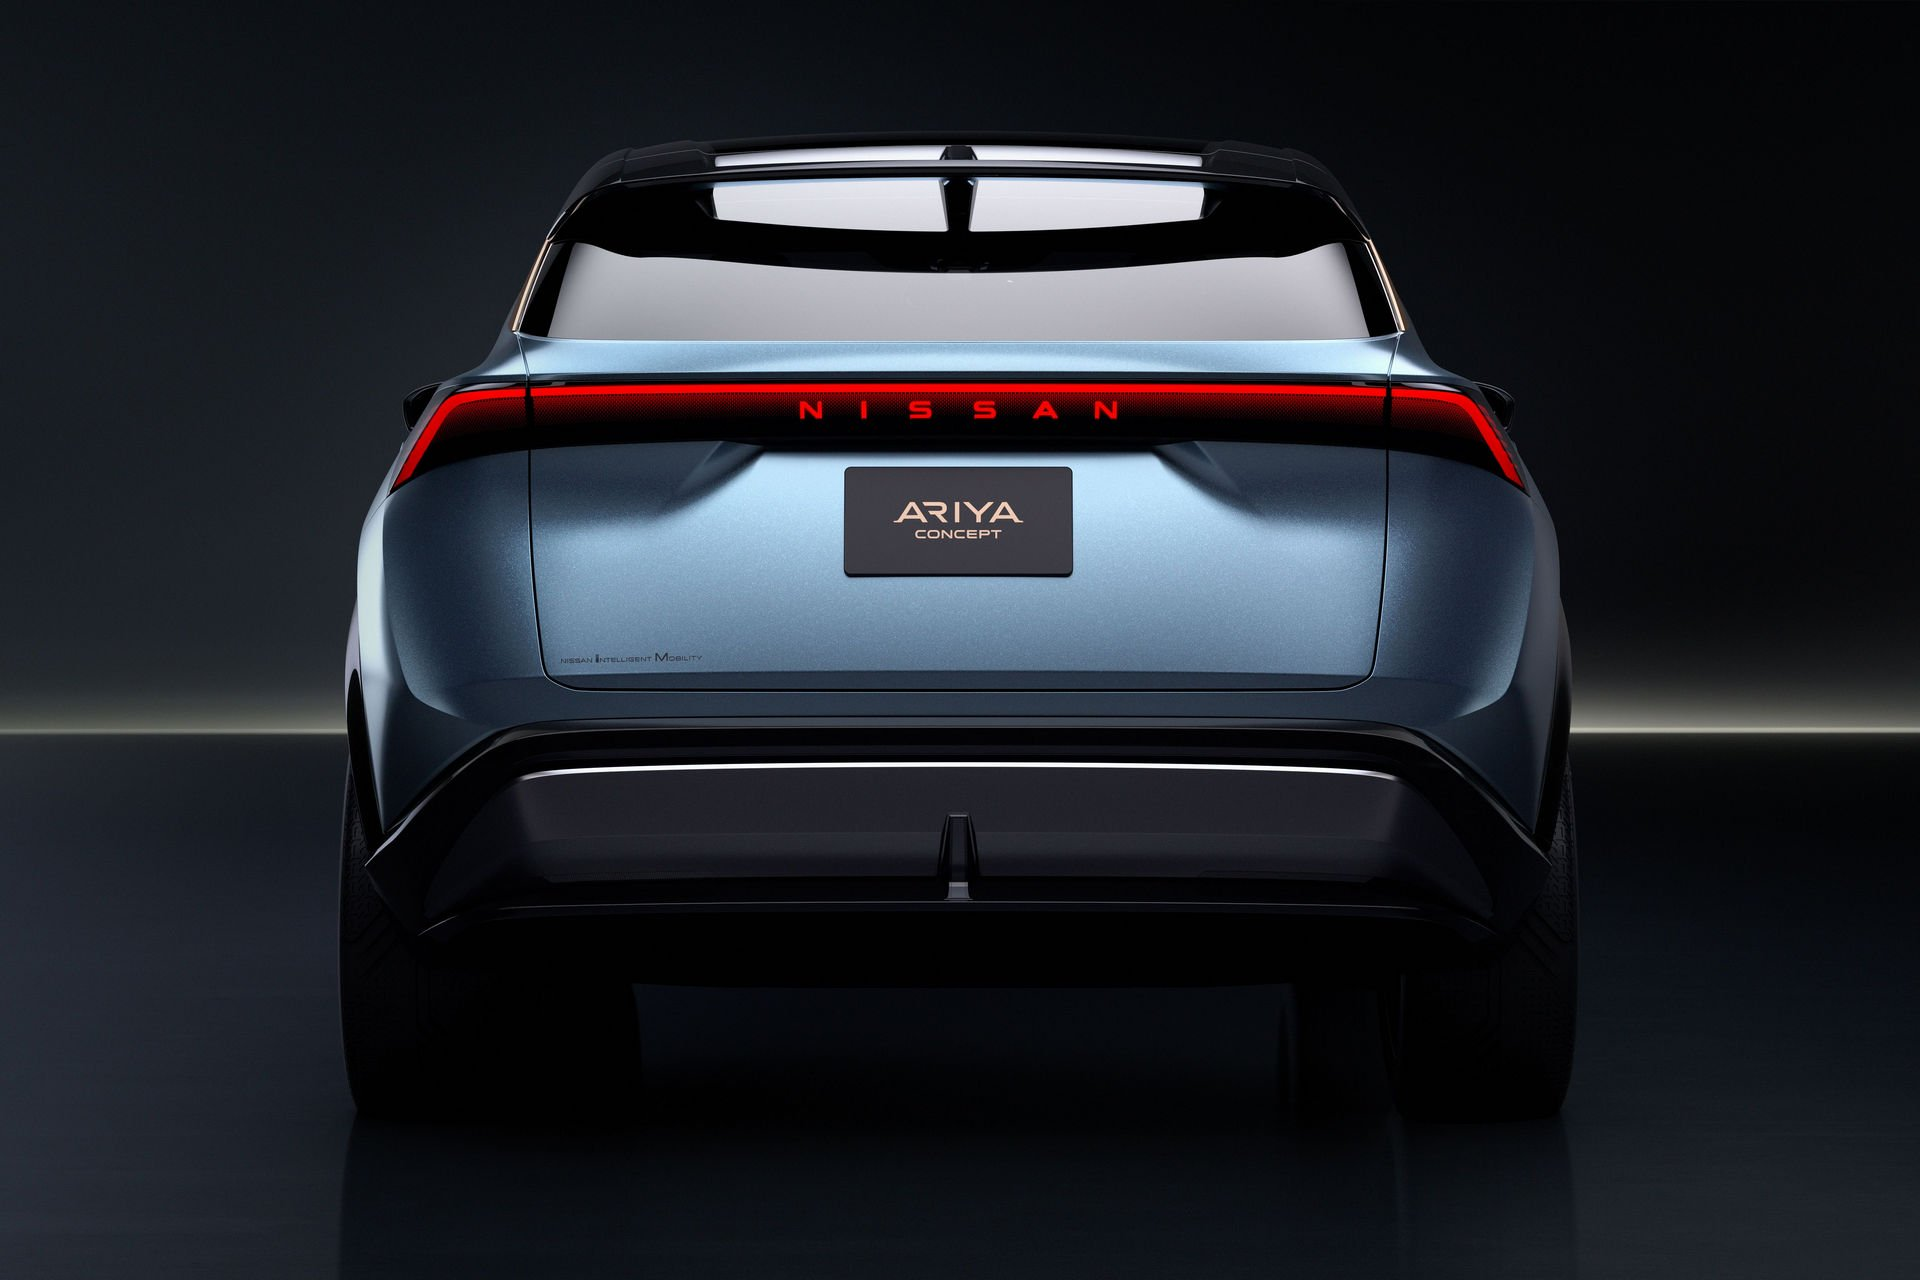 Nissan-Ariya-Concept-6